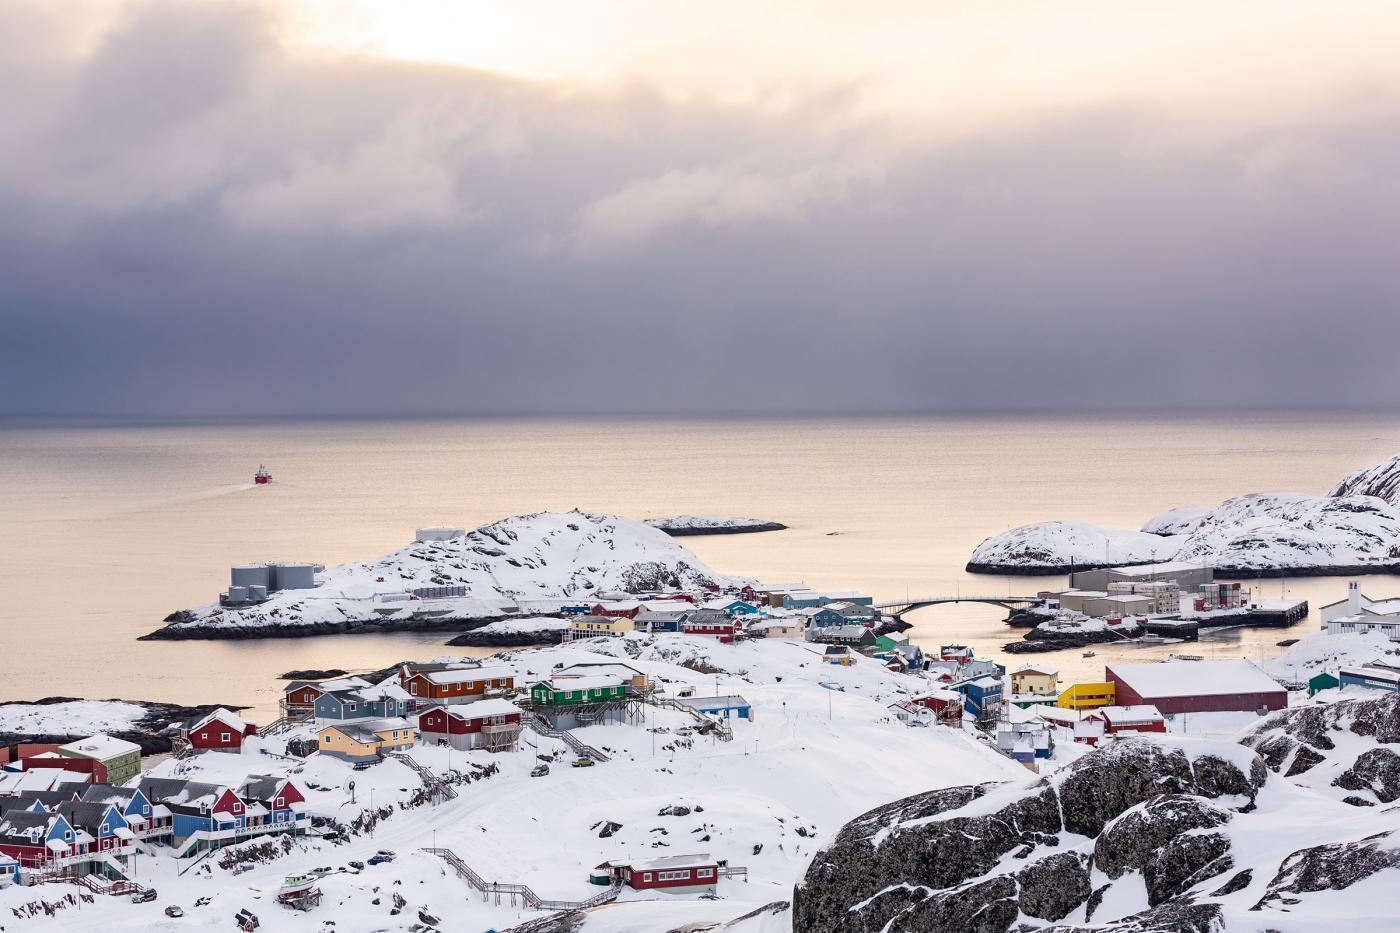 Panorama over Maniitsoq - Photo by Filip Gielda, Visit Greenland